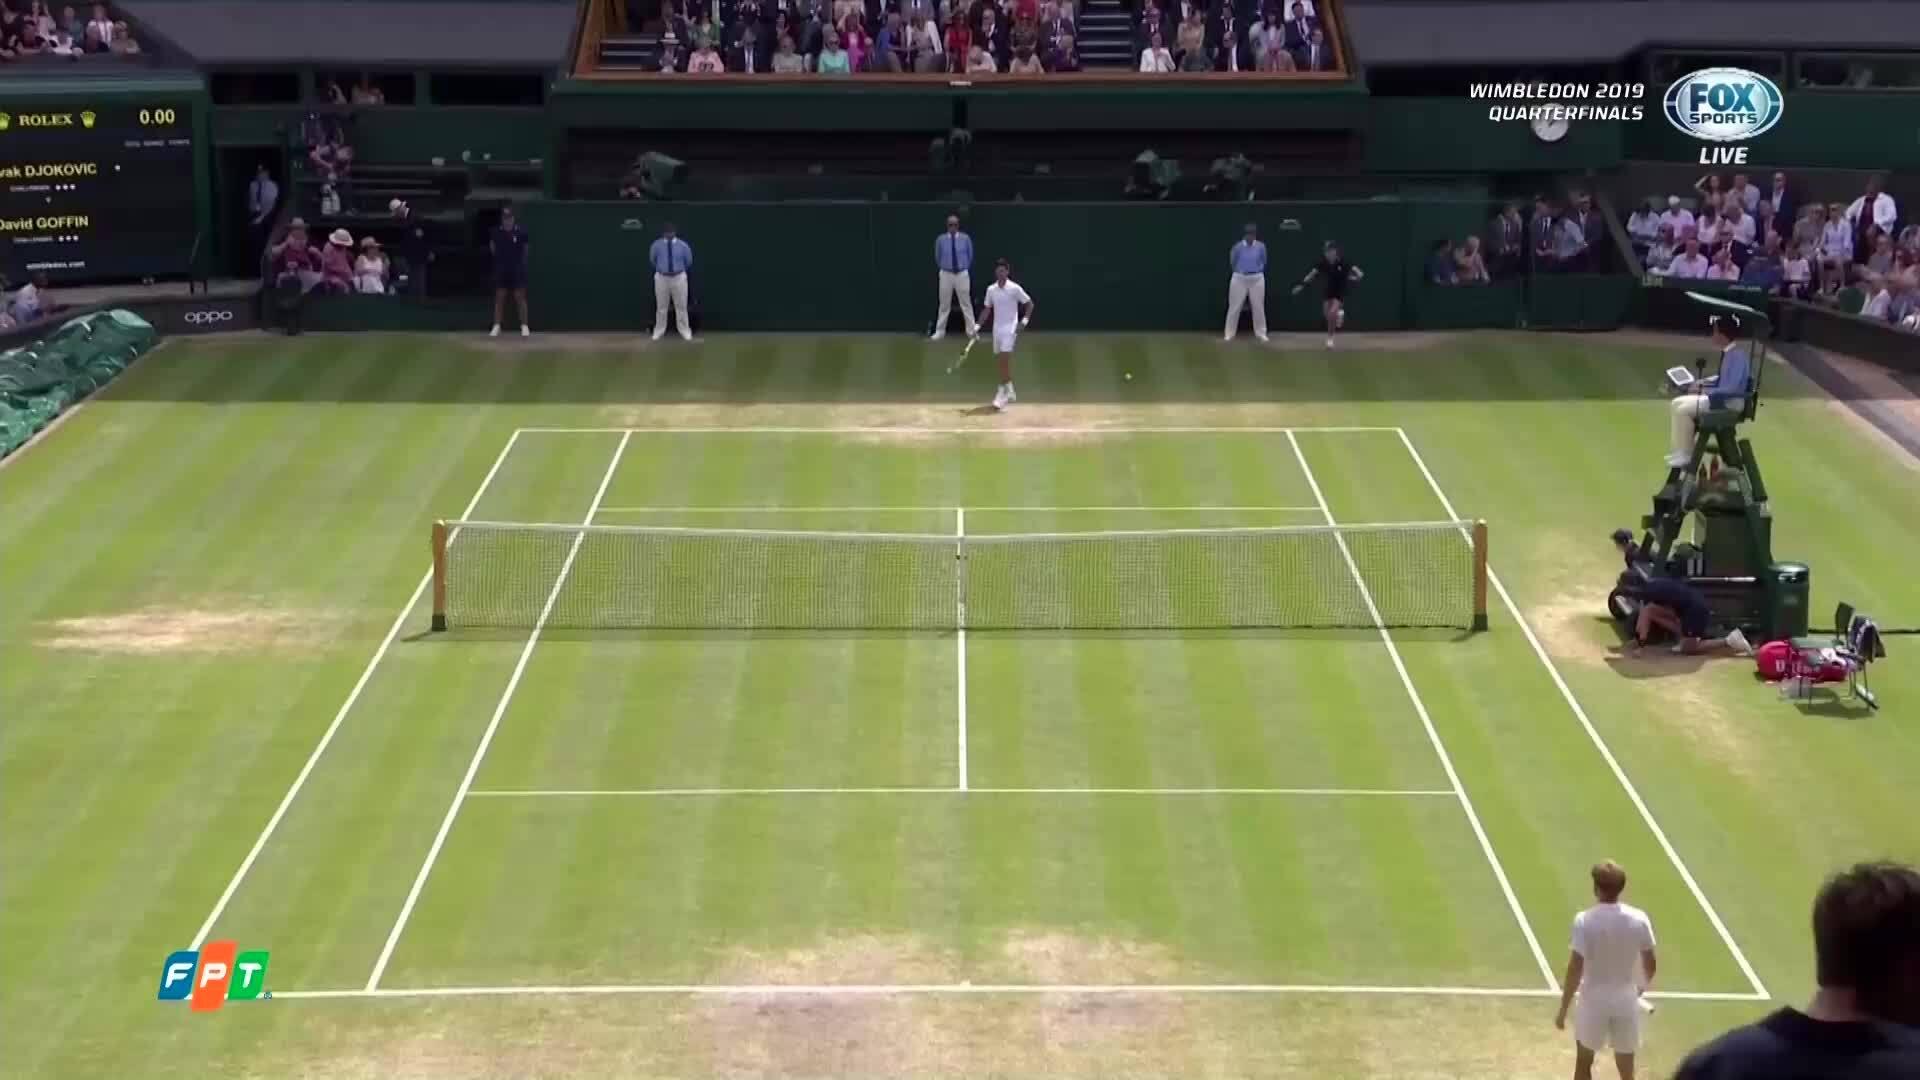 Novak Djokovic 3-0 David Goffin